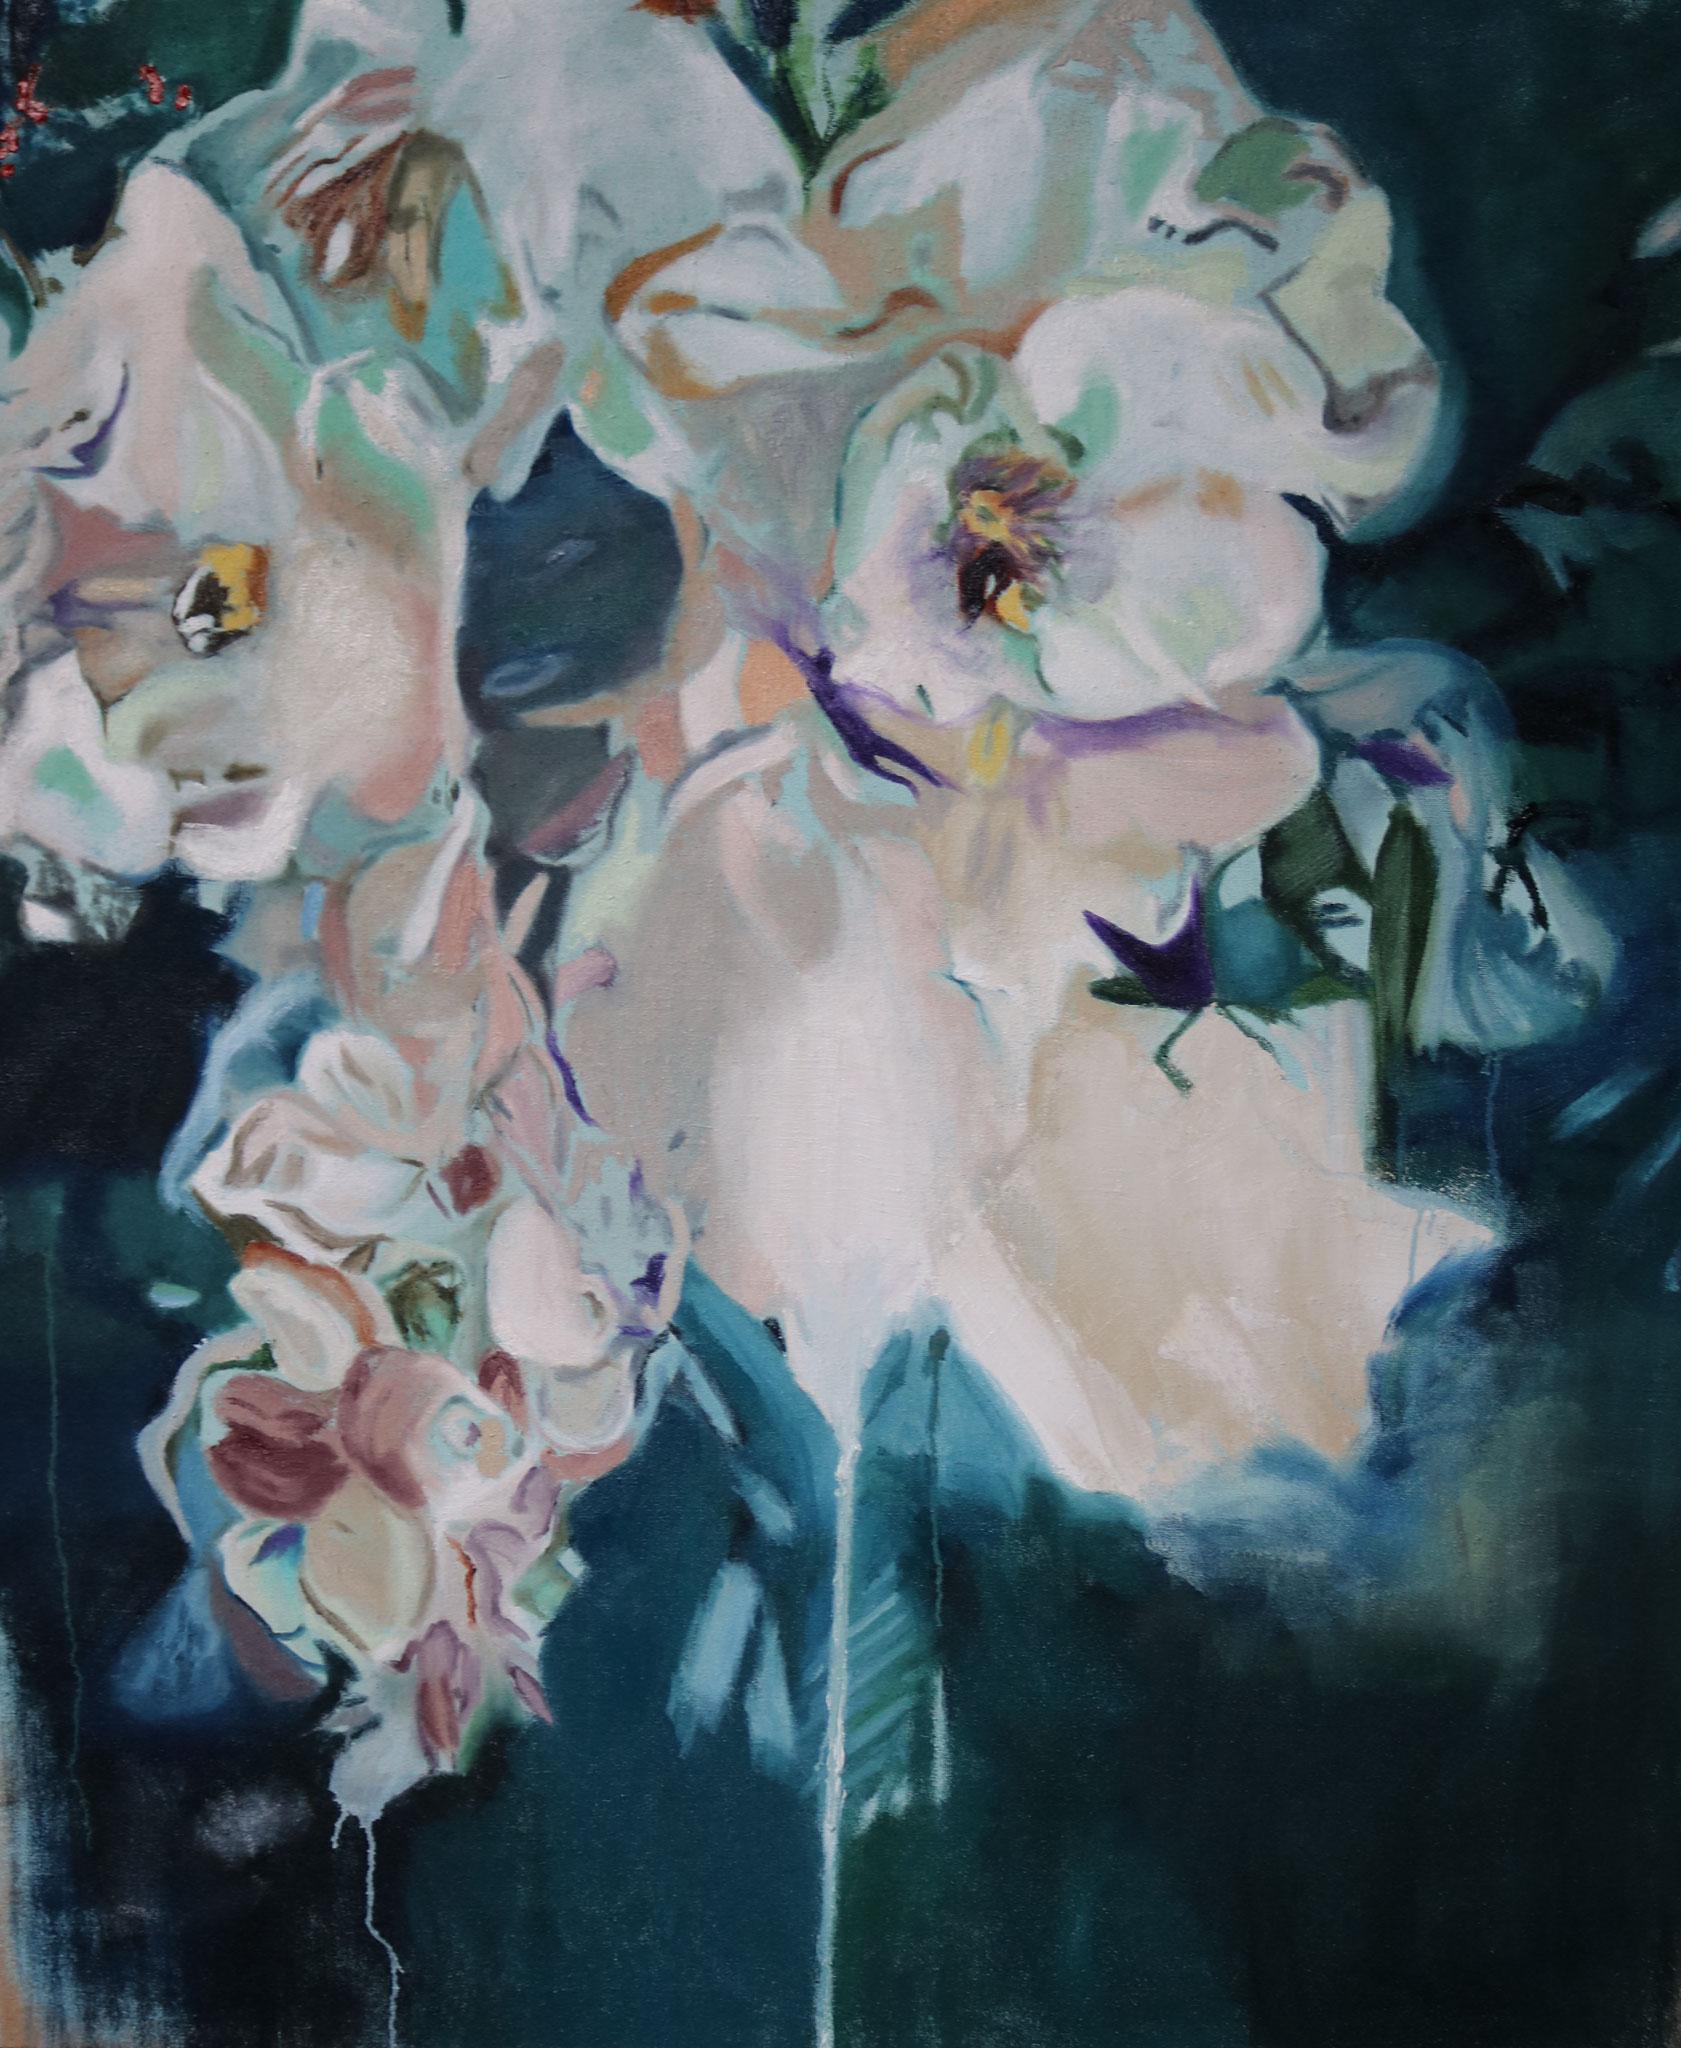 """Blumen I"" 145 x 180cm - Öl auf Leinwand"